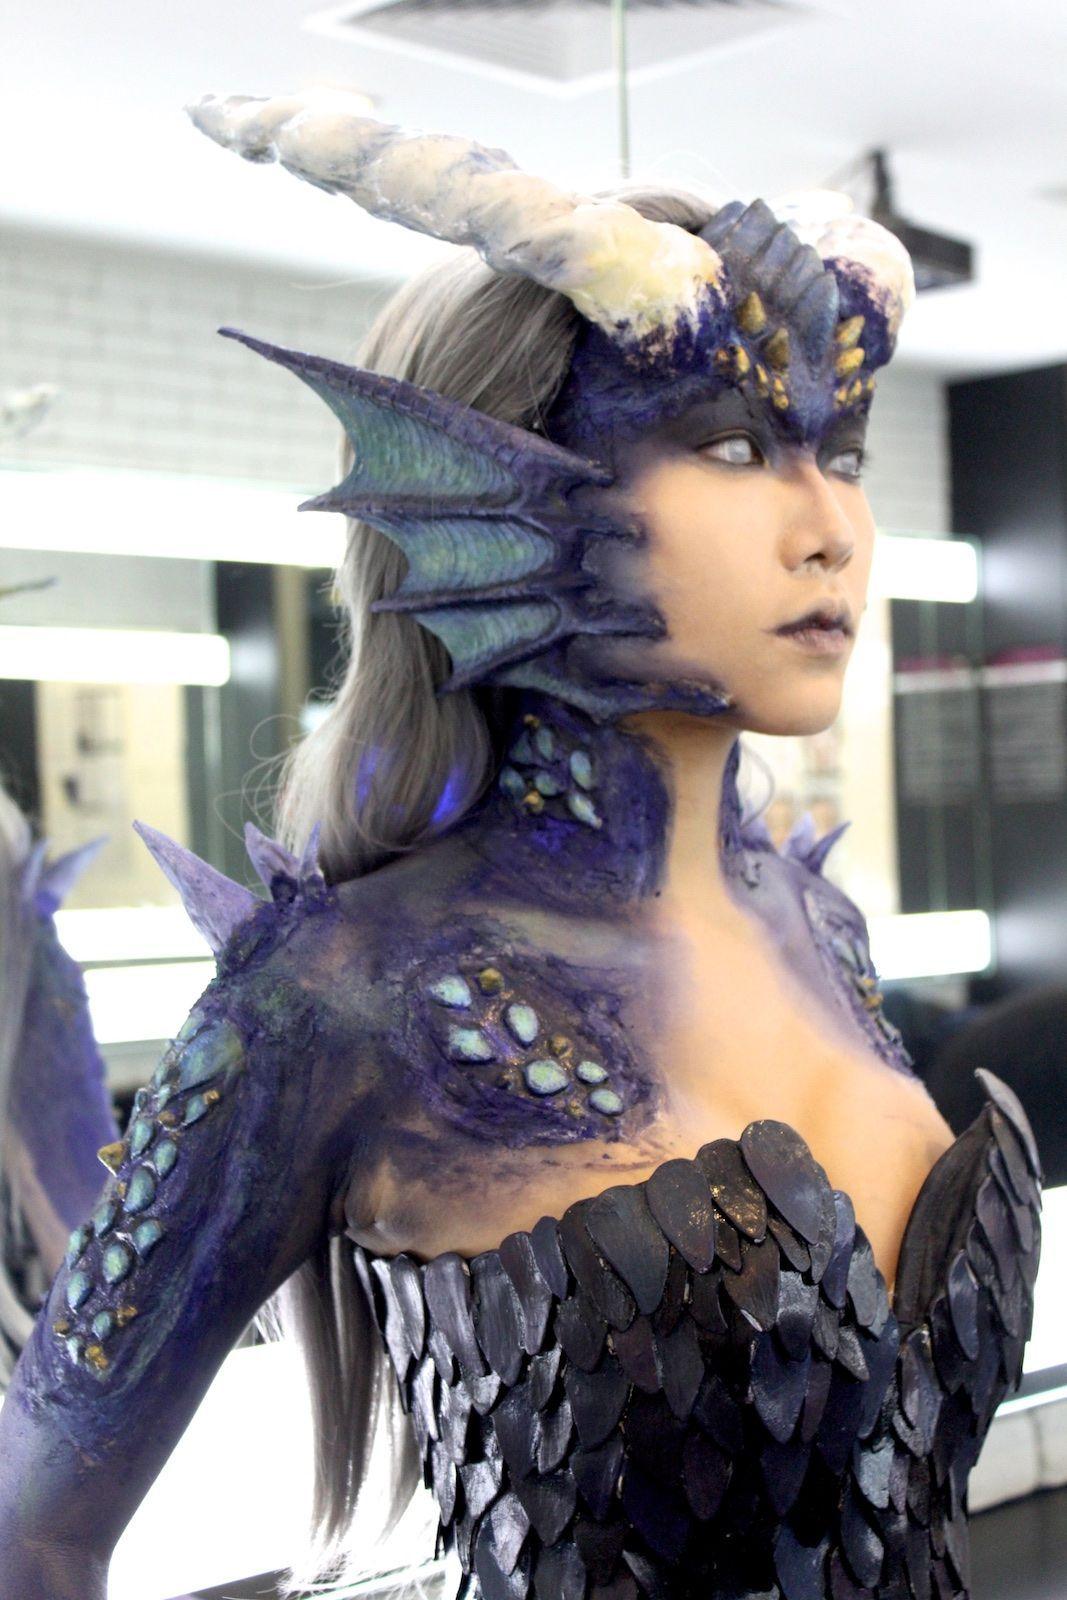 dragon prosthetic Google Search in 2020 Dragon makeup